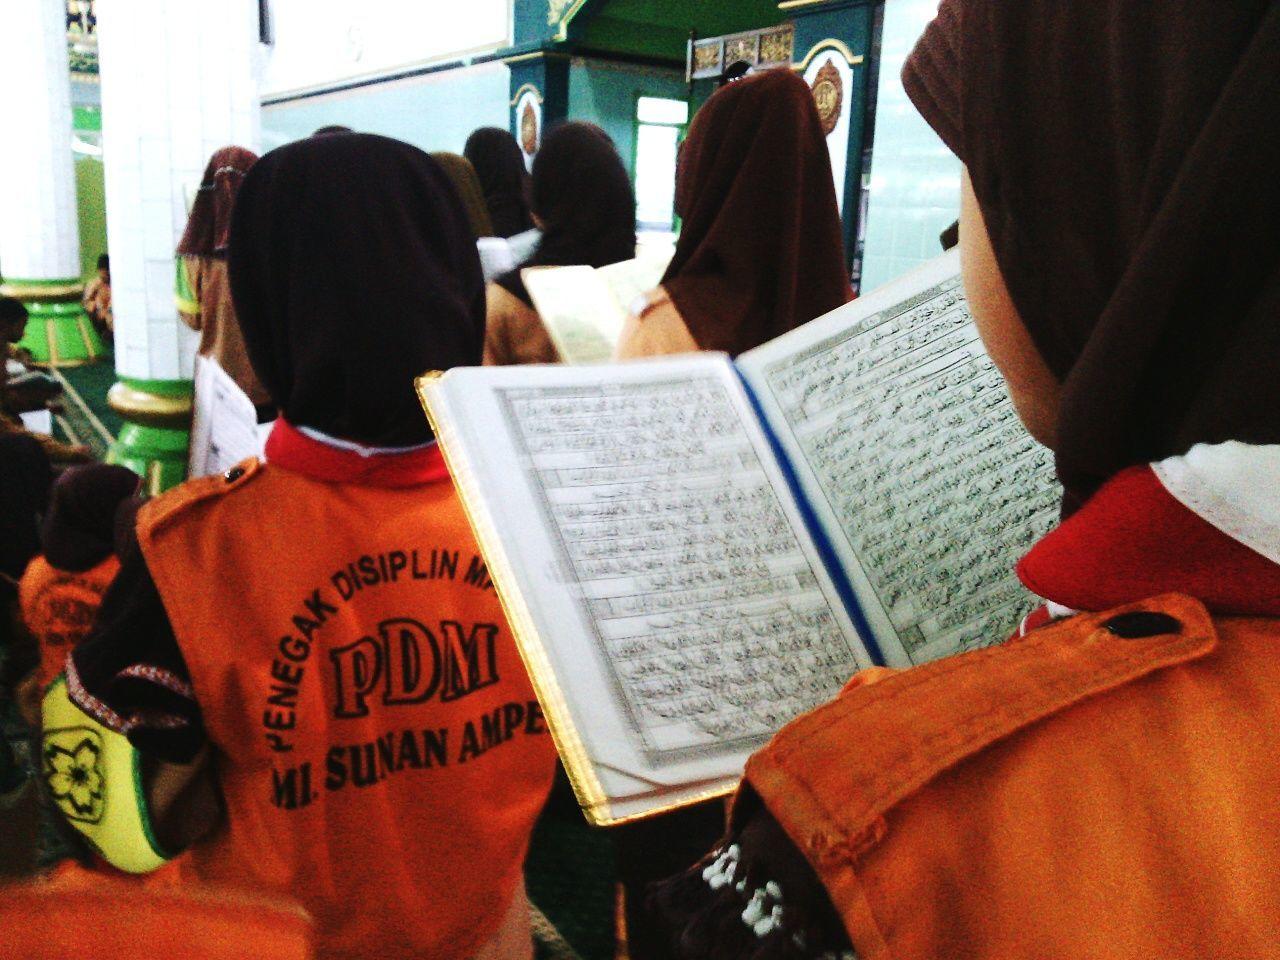 My Student Life Mengaji Qiroah Belajar sekolah Madrasah Sunan Ampel Keagamaan Religius Masjid Mosque